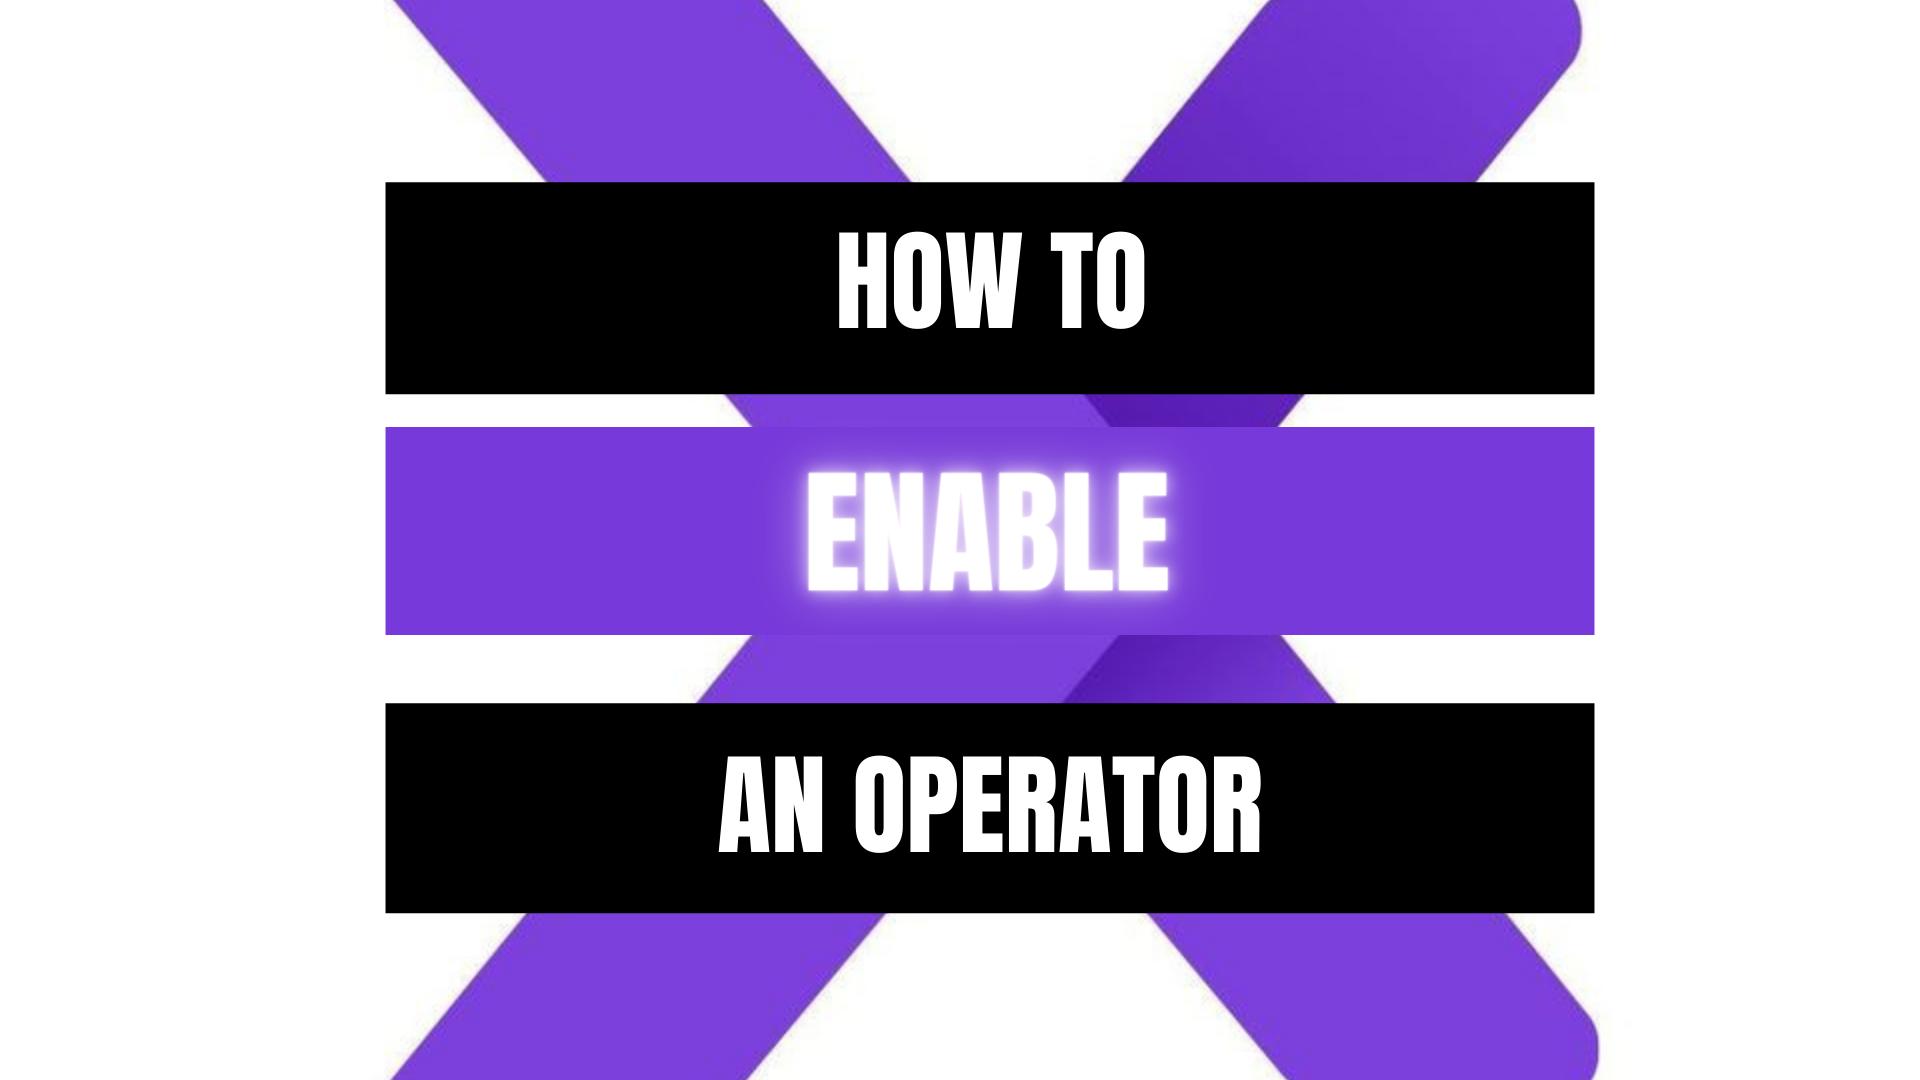 Peekaboox - Enable an Operator